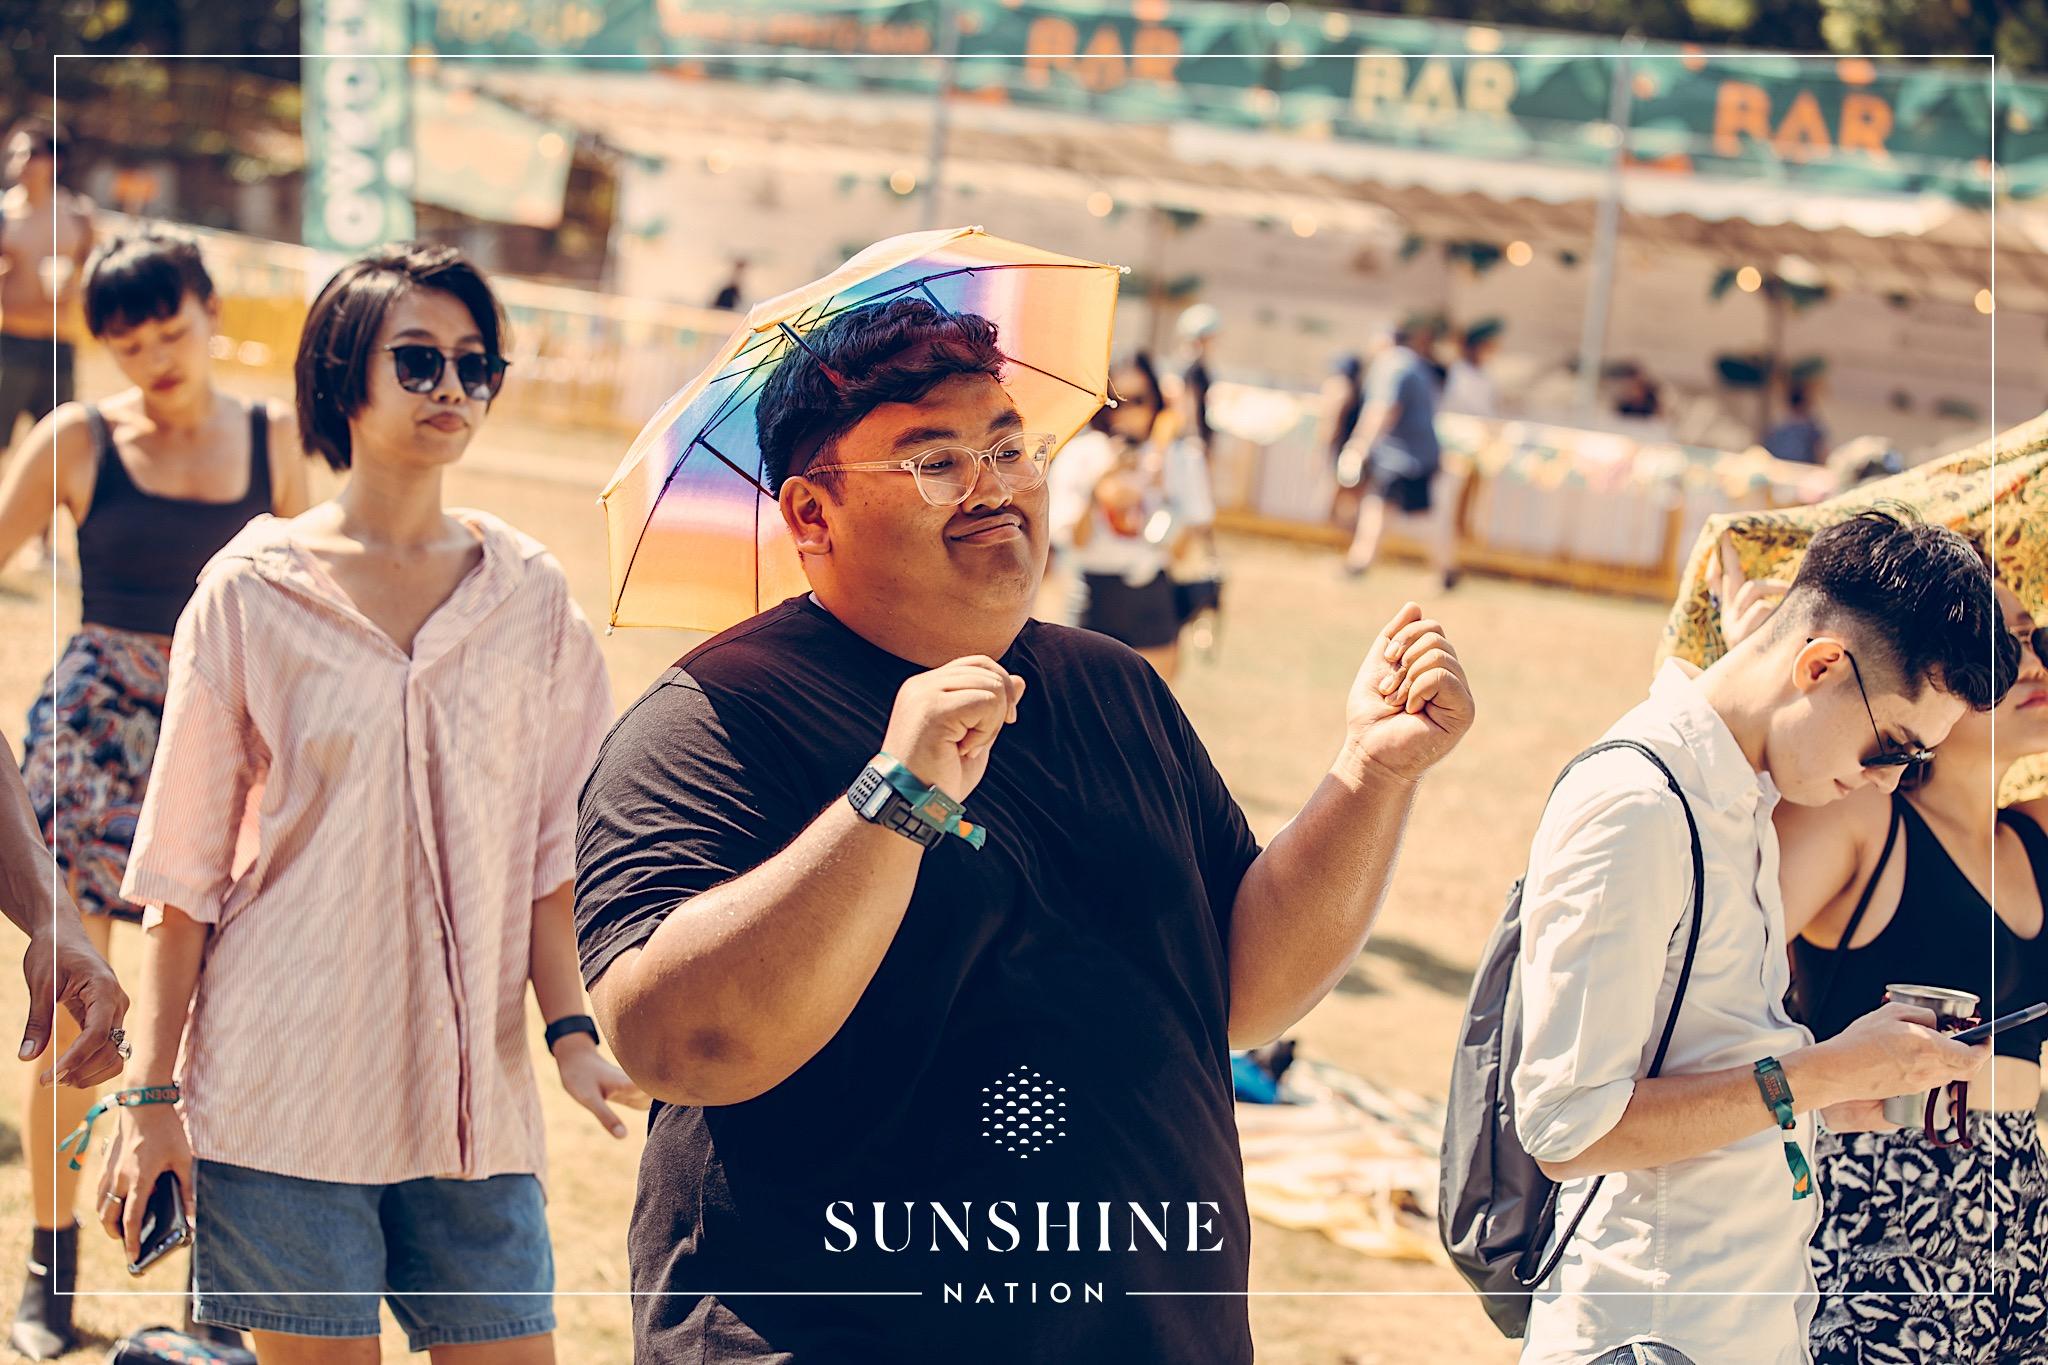 09032019_SunshineNation_Colossal139_Watermarked.jpg